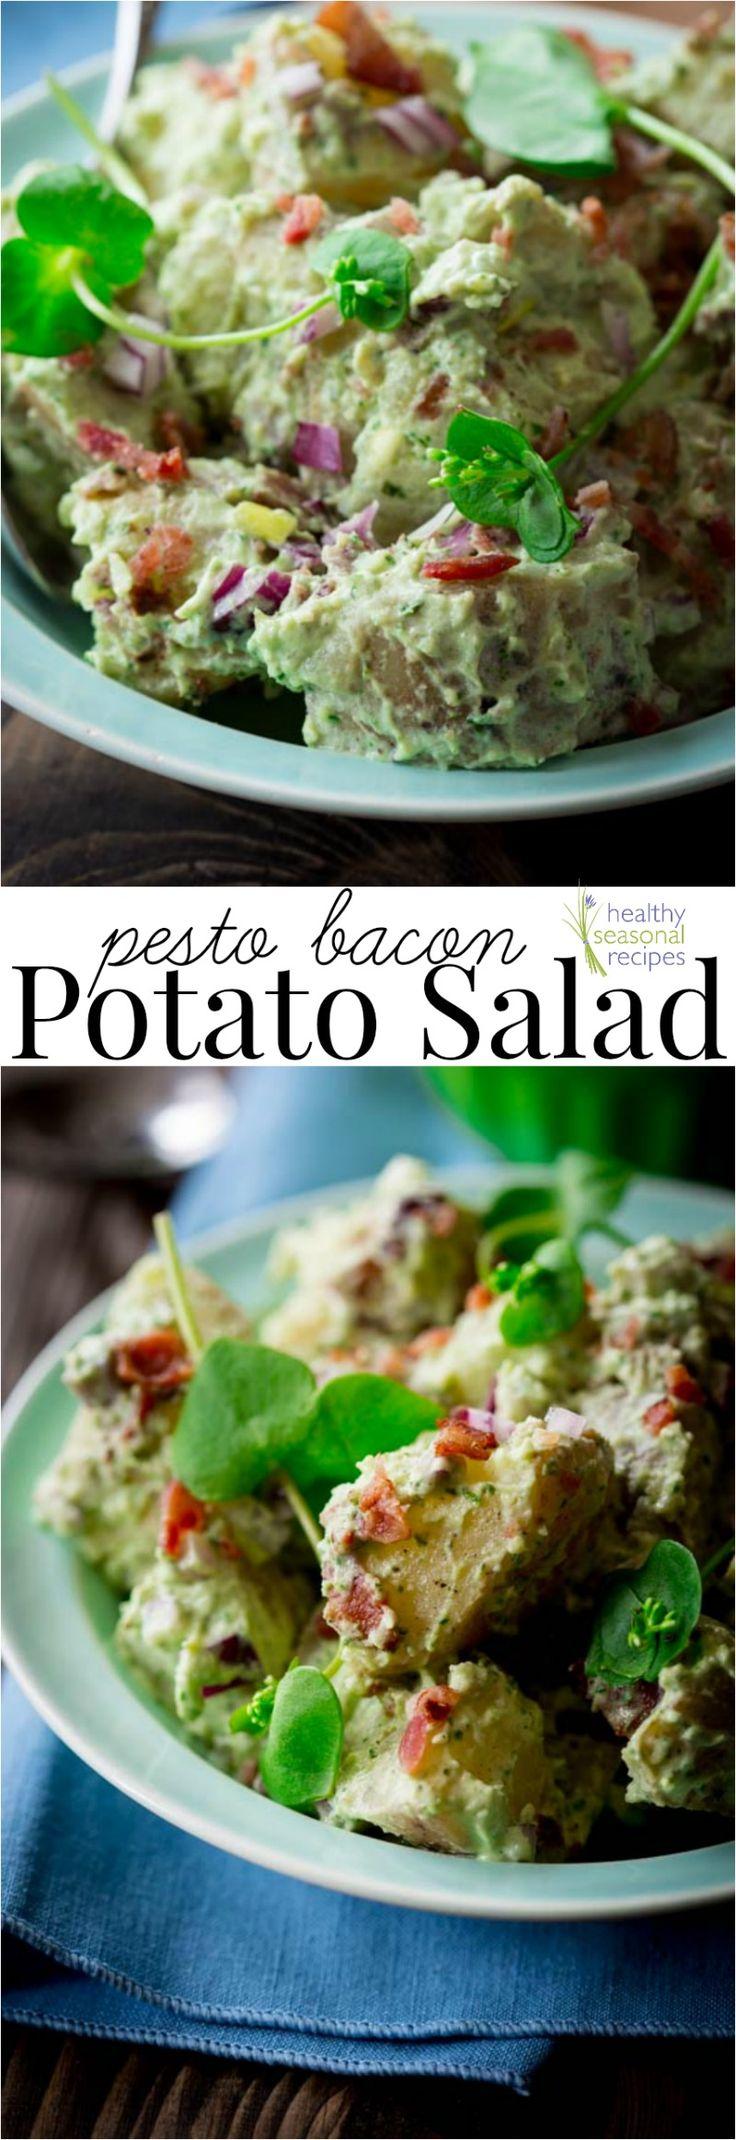 Best 25 Easy Potato Salad Ideas On Pinterest Easy